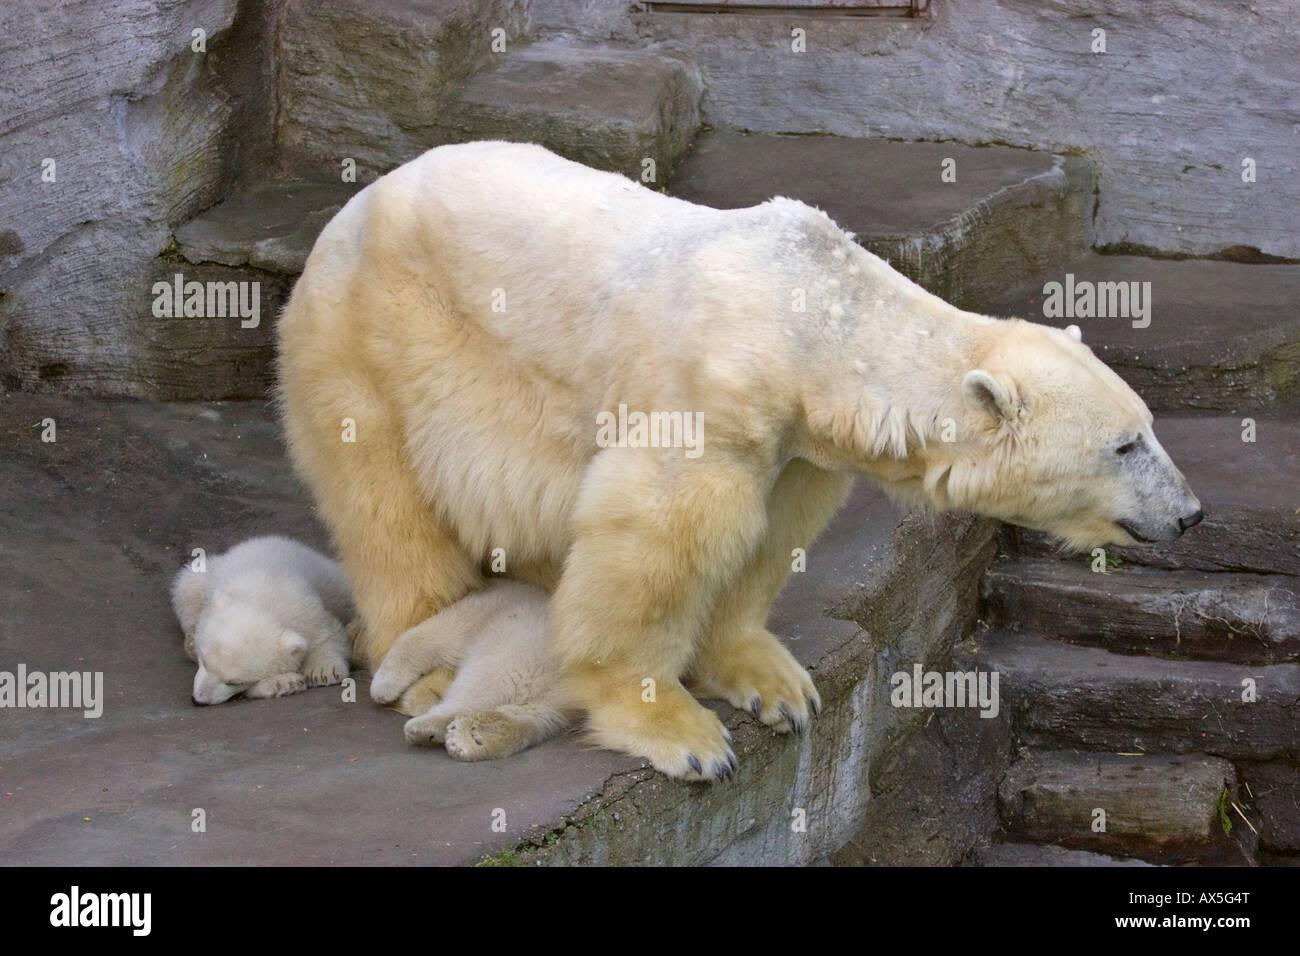 Polar Bear (Ursus maritimus) cubs, twins born December 2007 at Schoenbrunn Zoo, Vienna, Austria, Europe Stock Photo